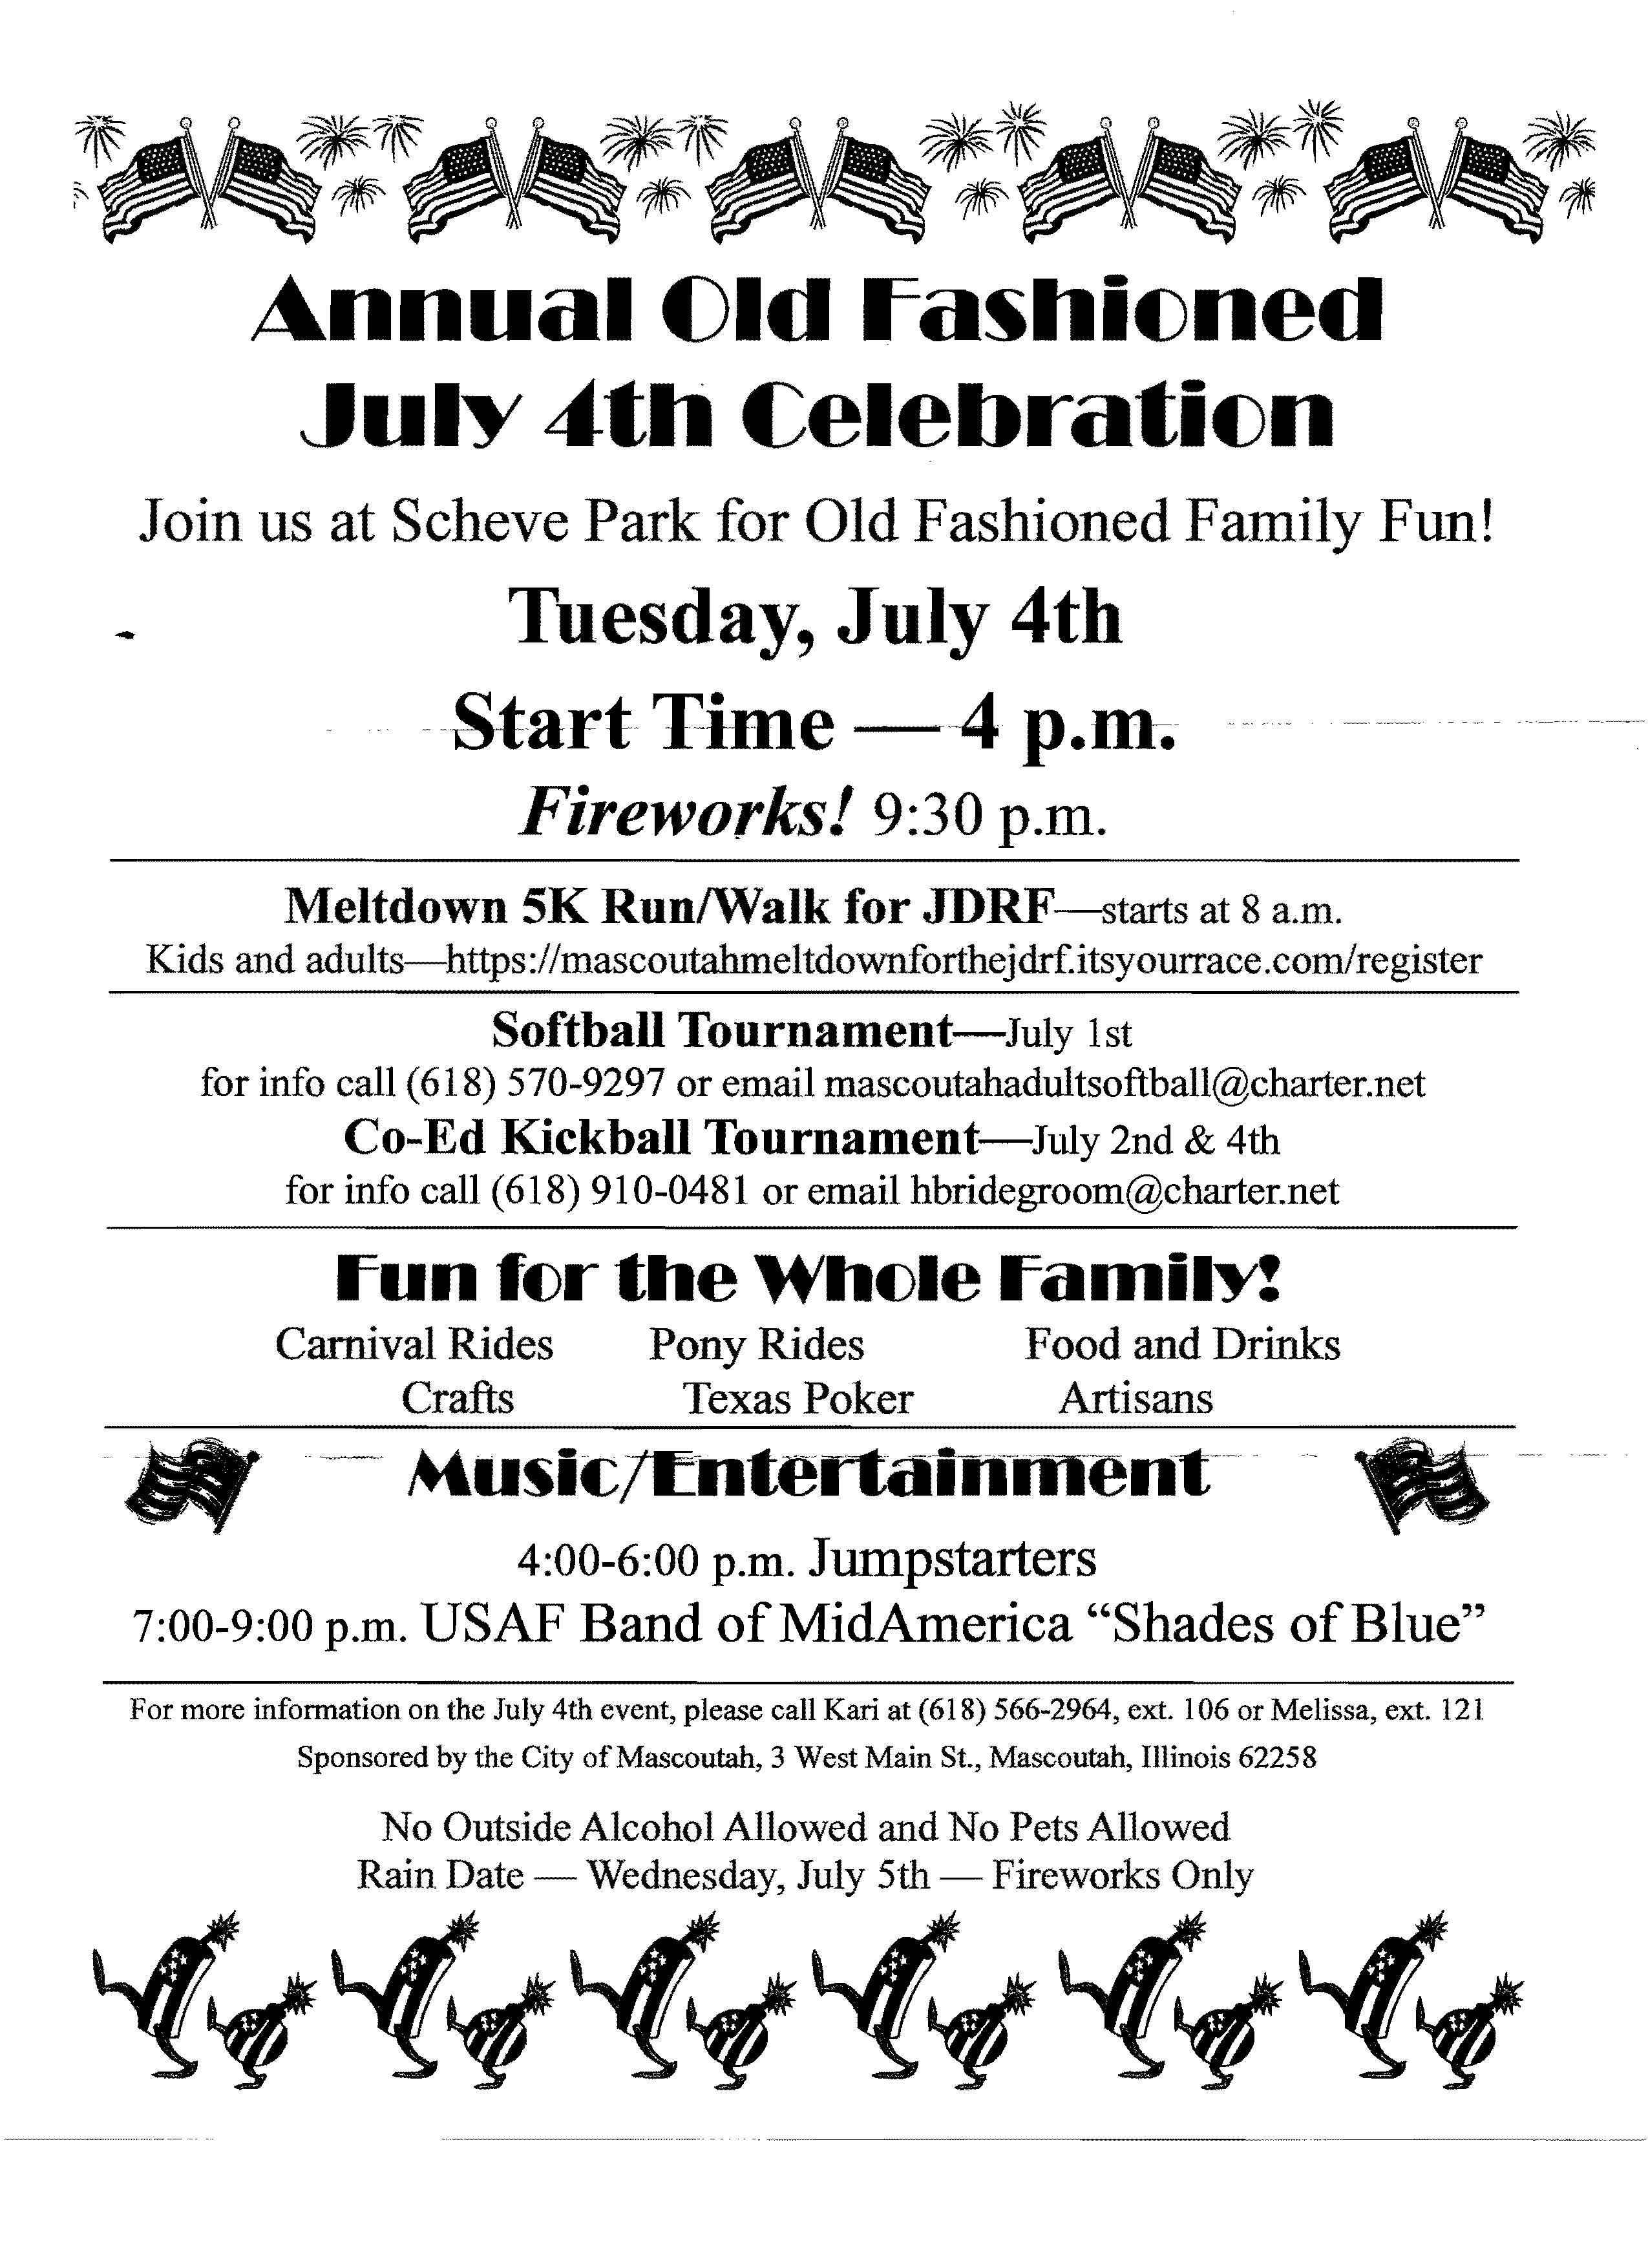 Old Fashioned July 4th Celebration